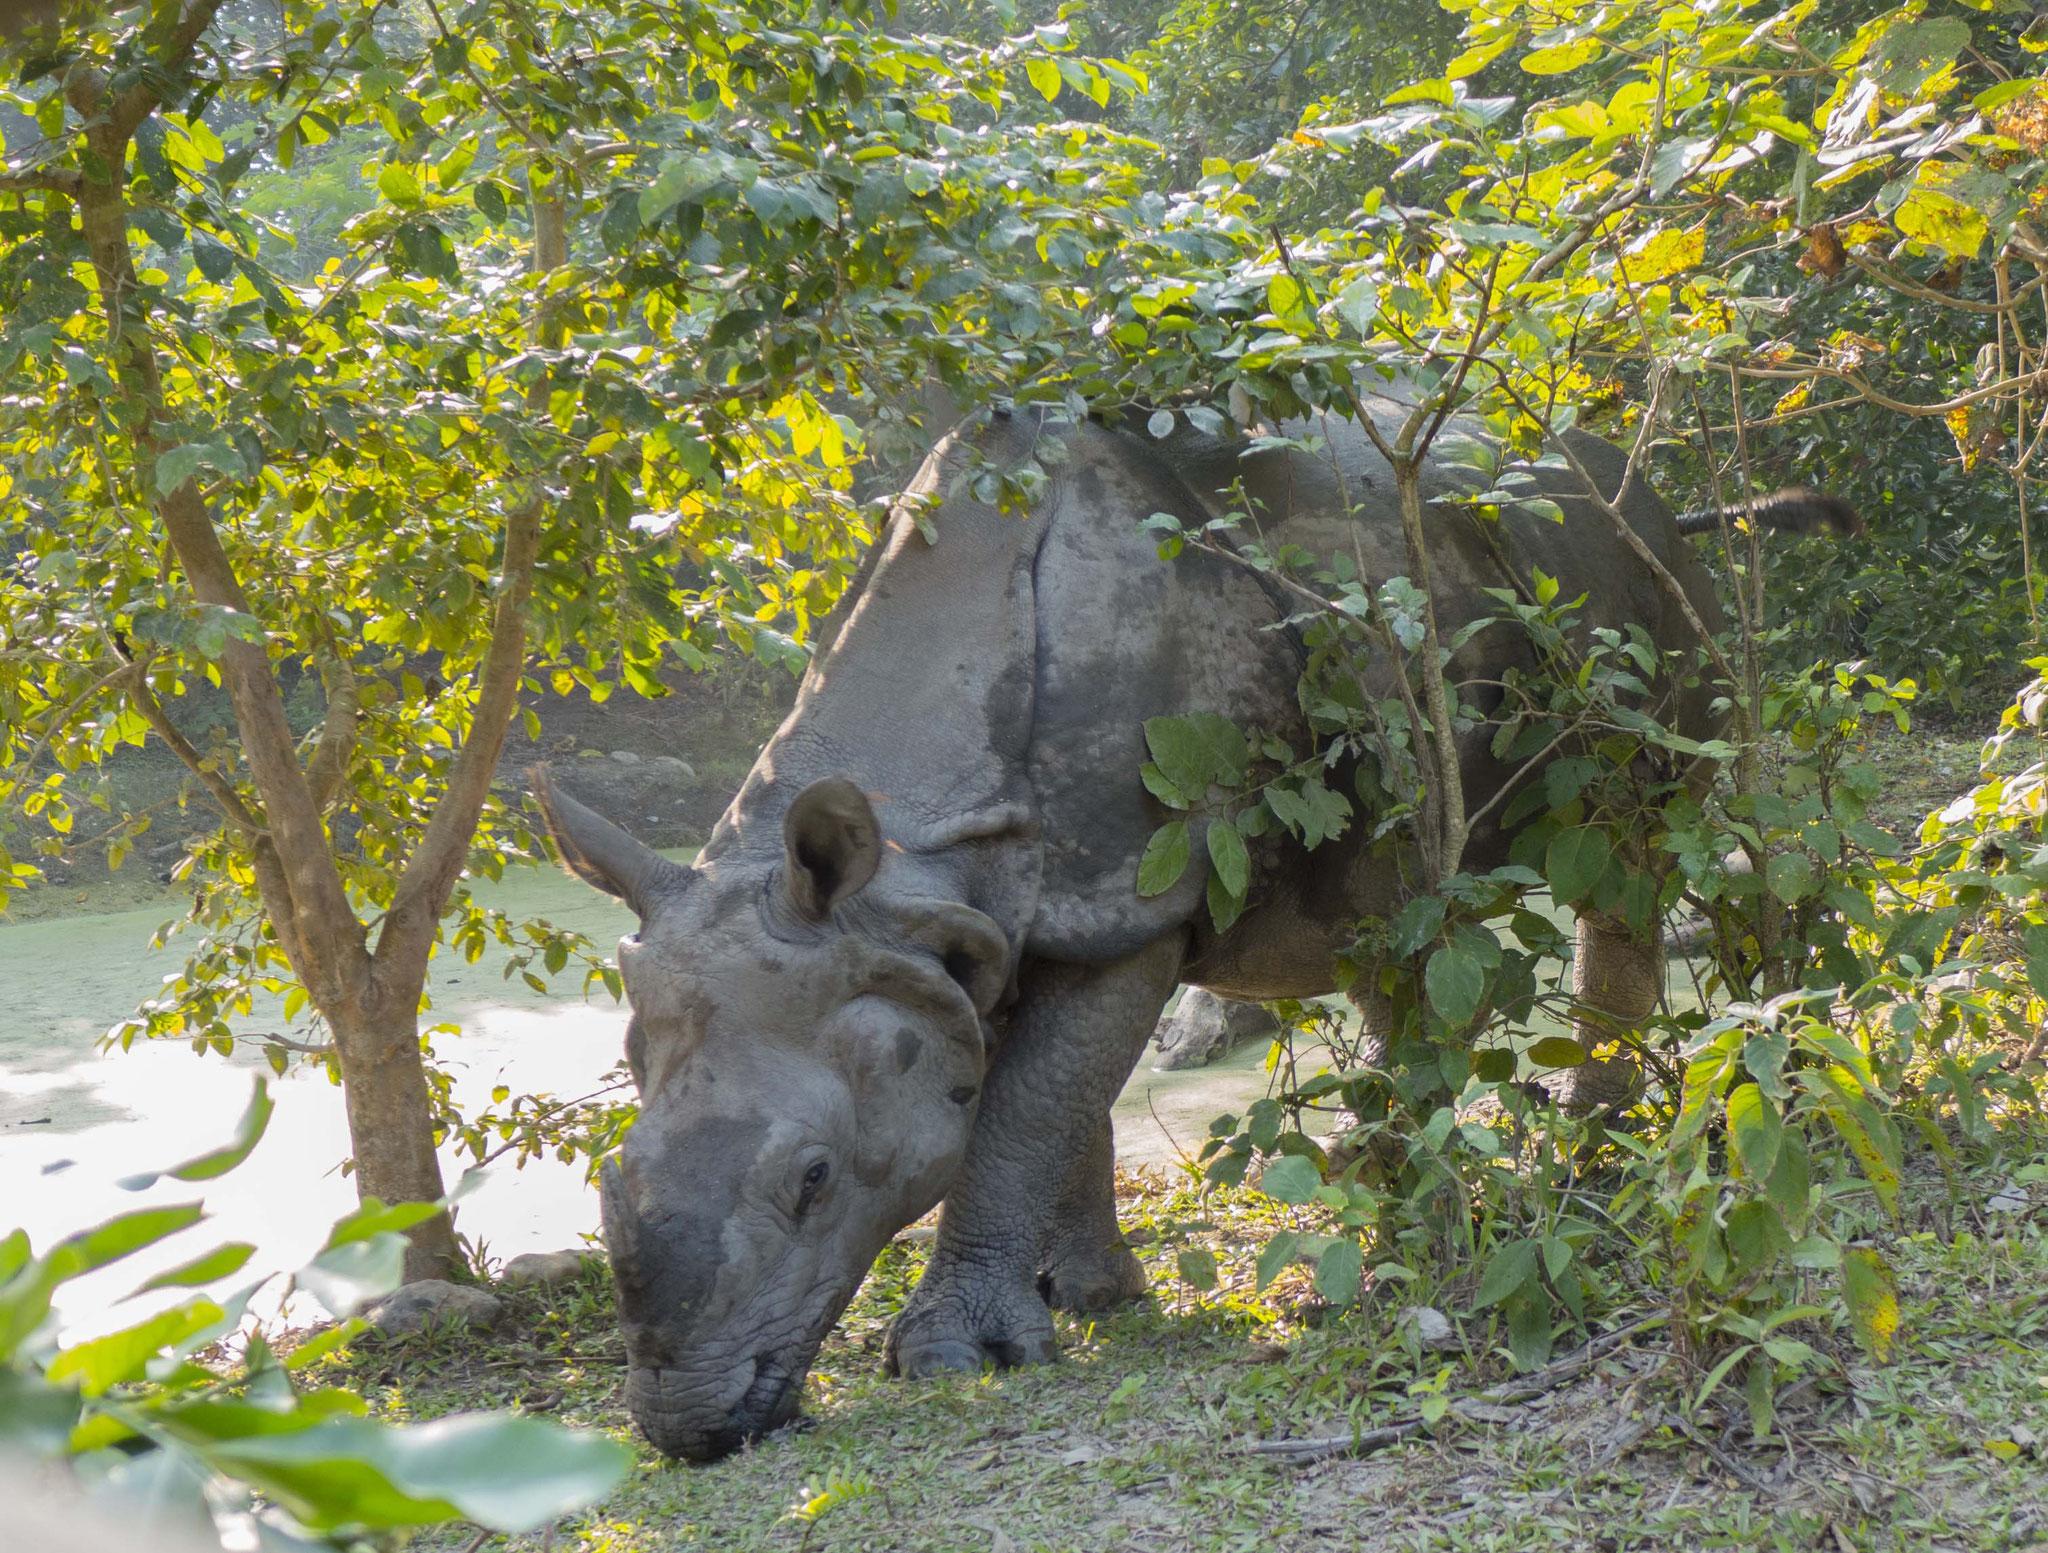 A blind rhino.